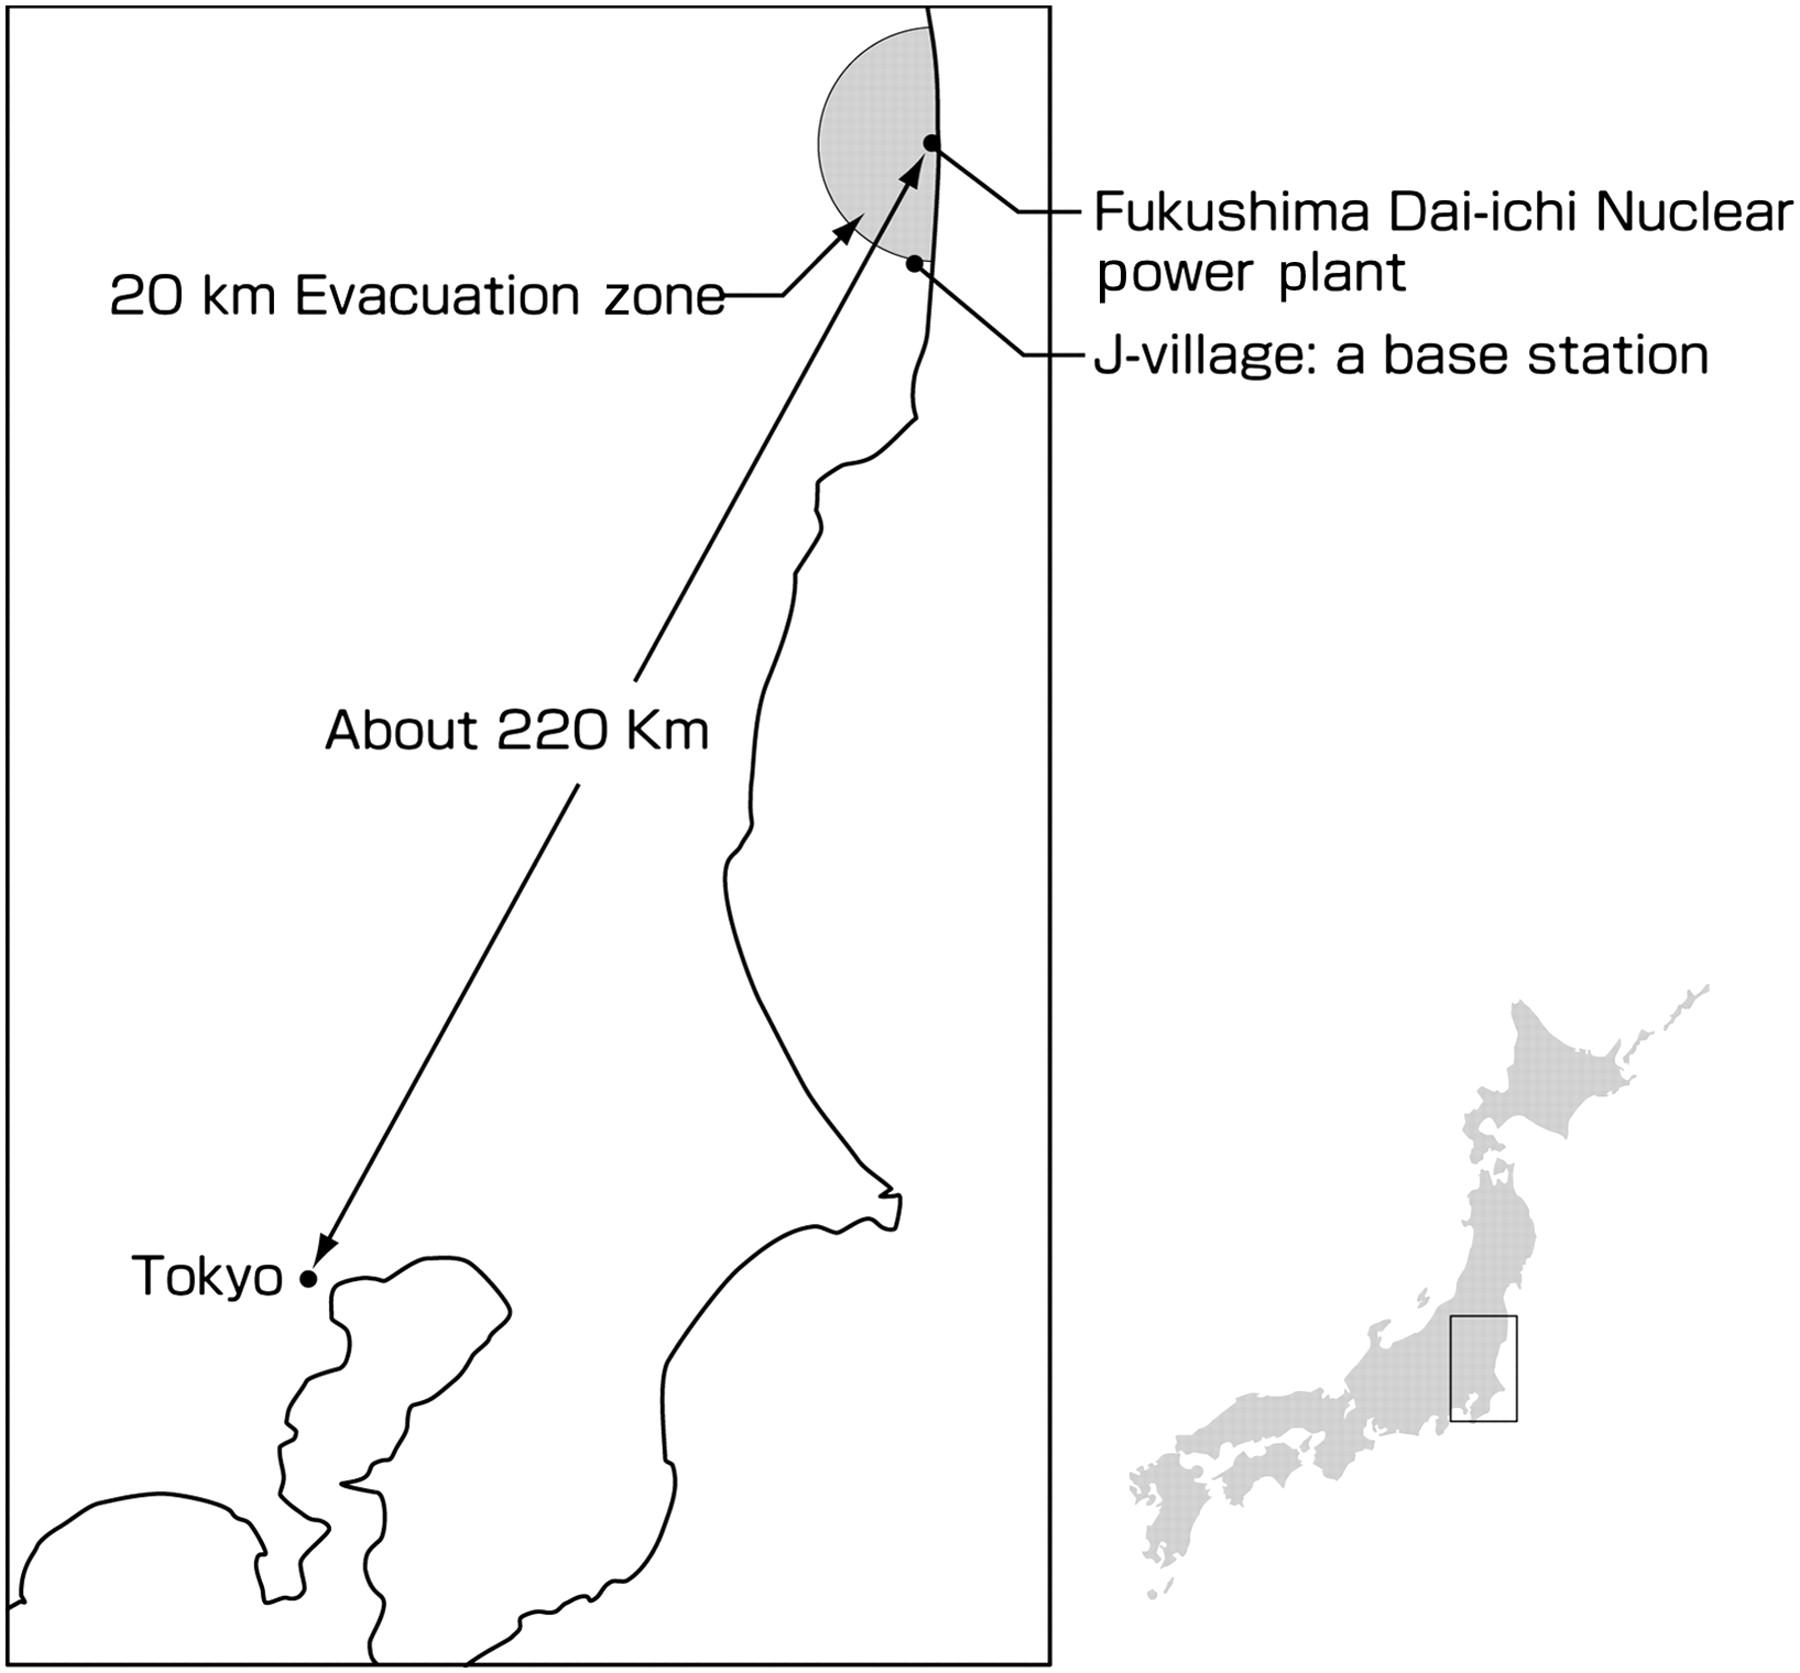 Emergency response technical work at Fukushima Dai-ichi